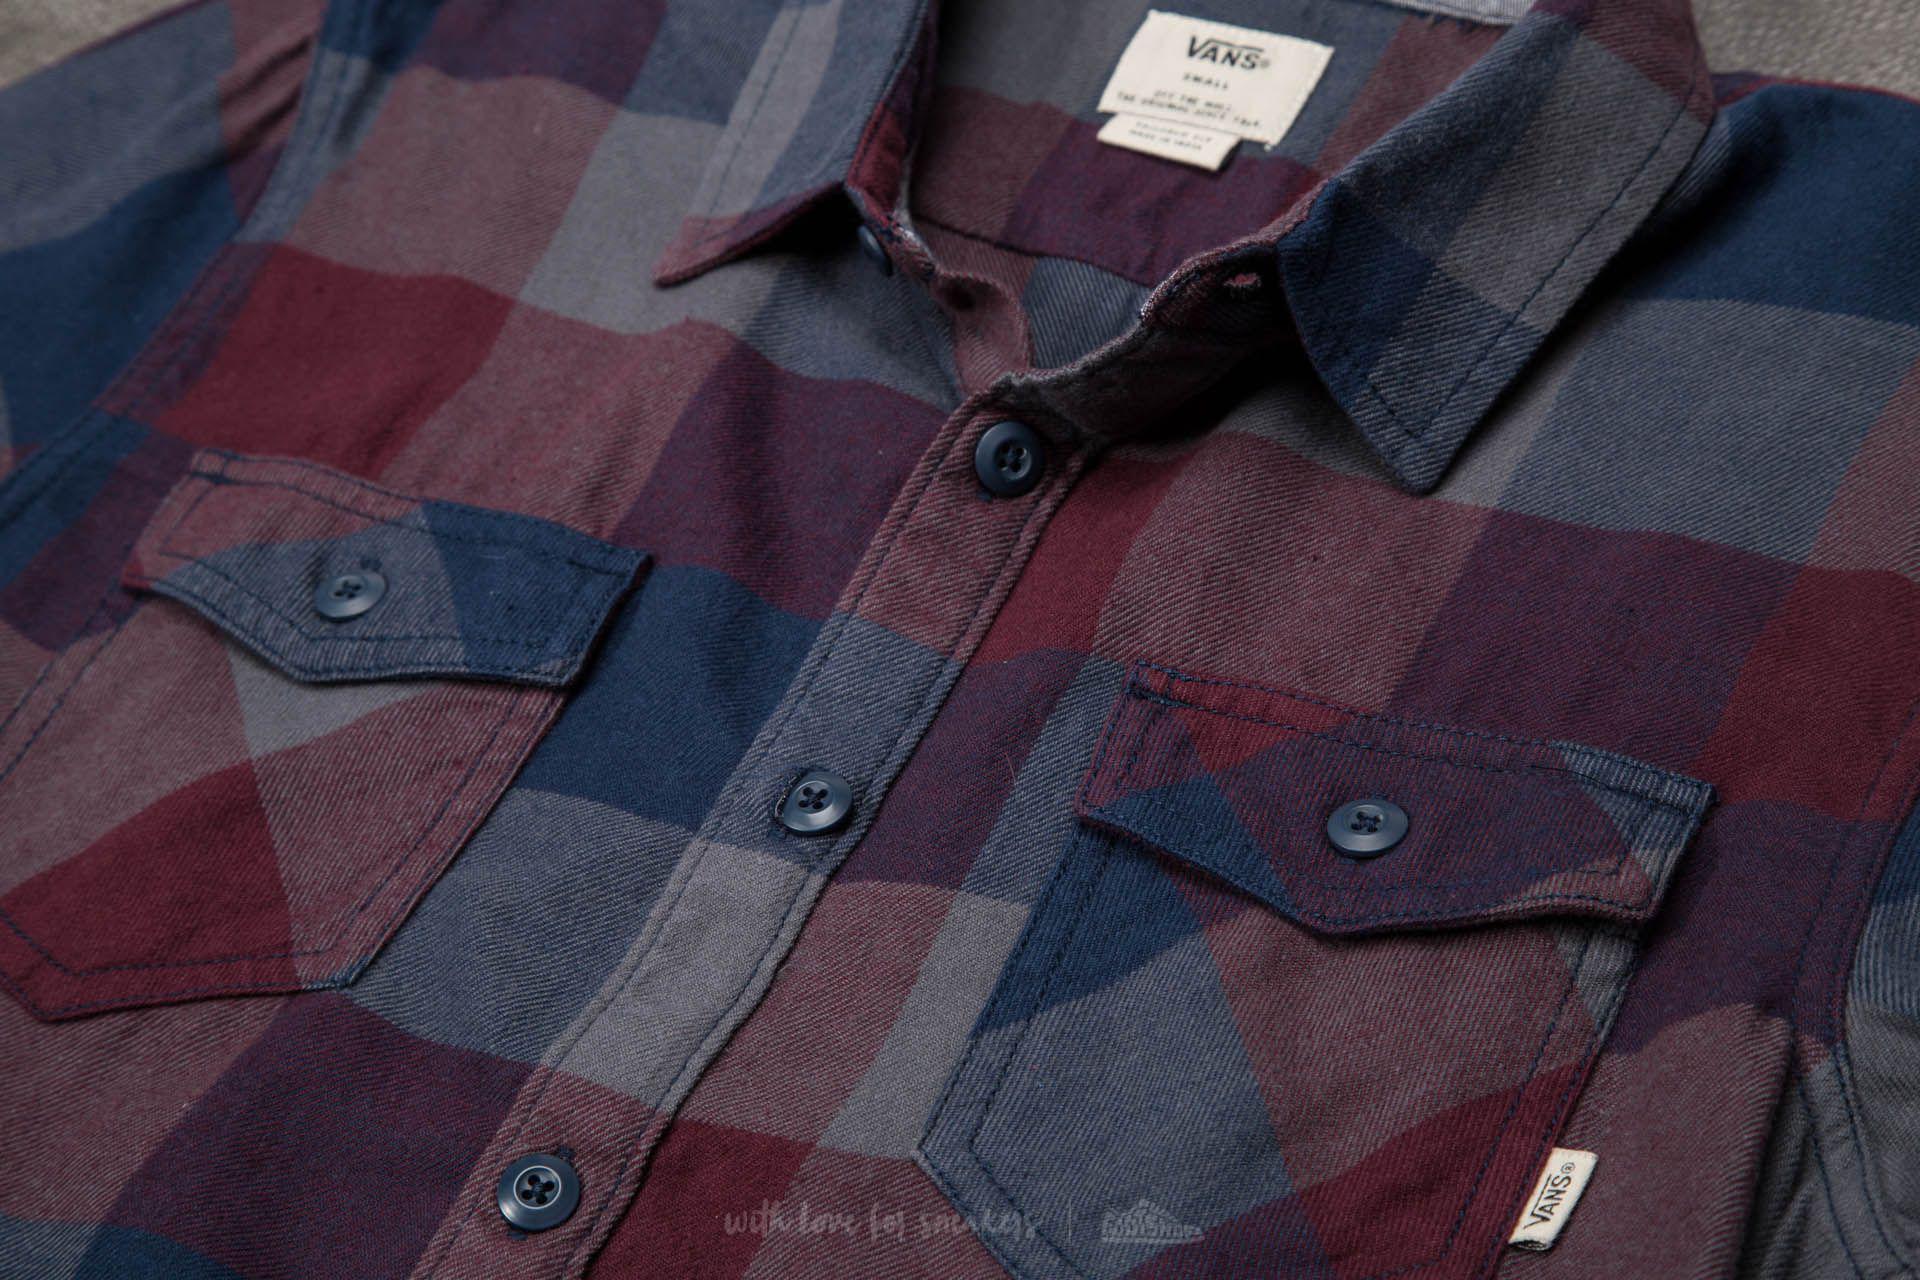 04817f6f09 Lyst - Vans Box Flannel Shirt Dress Blues-port Royale in Blue for Men